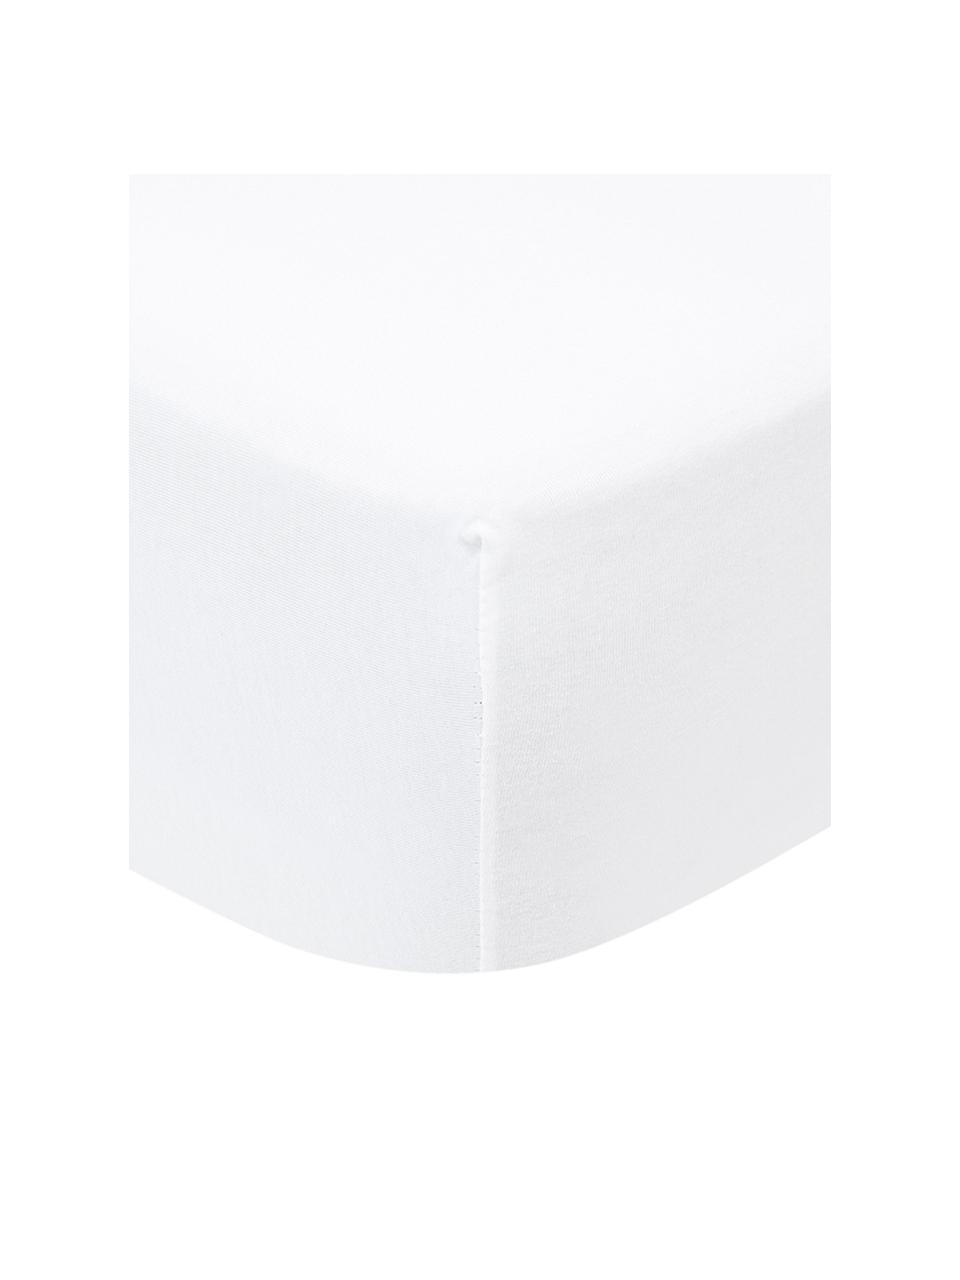 Lenzuolo con angoli boxspring in jersey-elastan bianco Lara, 95% cotone, 5% elastan, Bianco, Larg. 180 x Lung. 200 cm